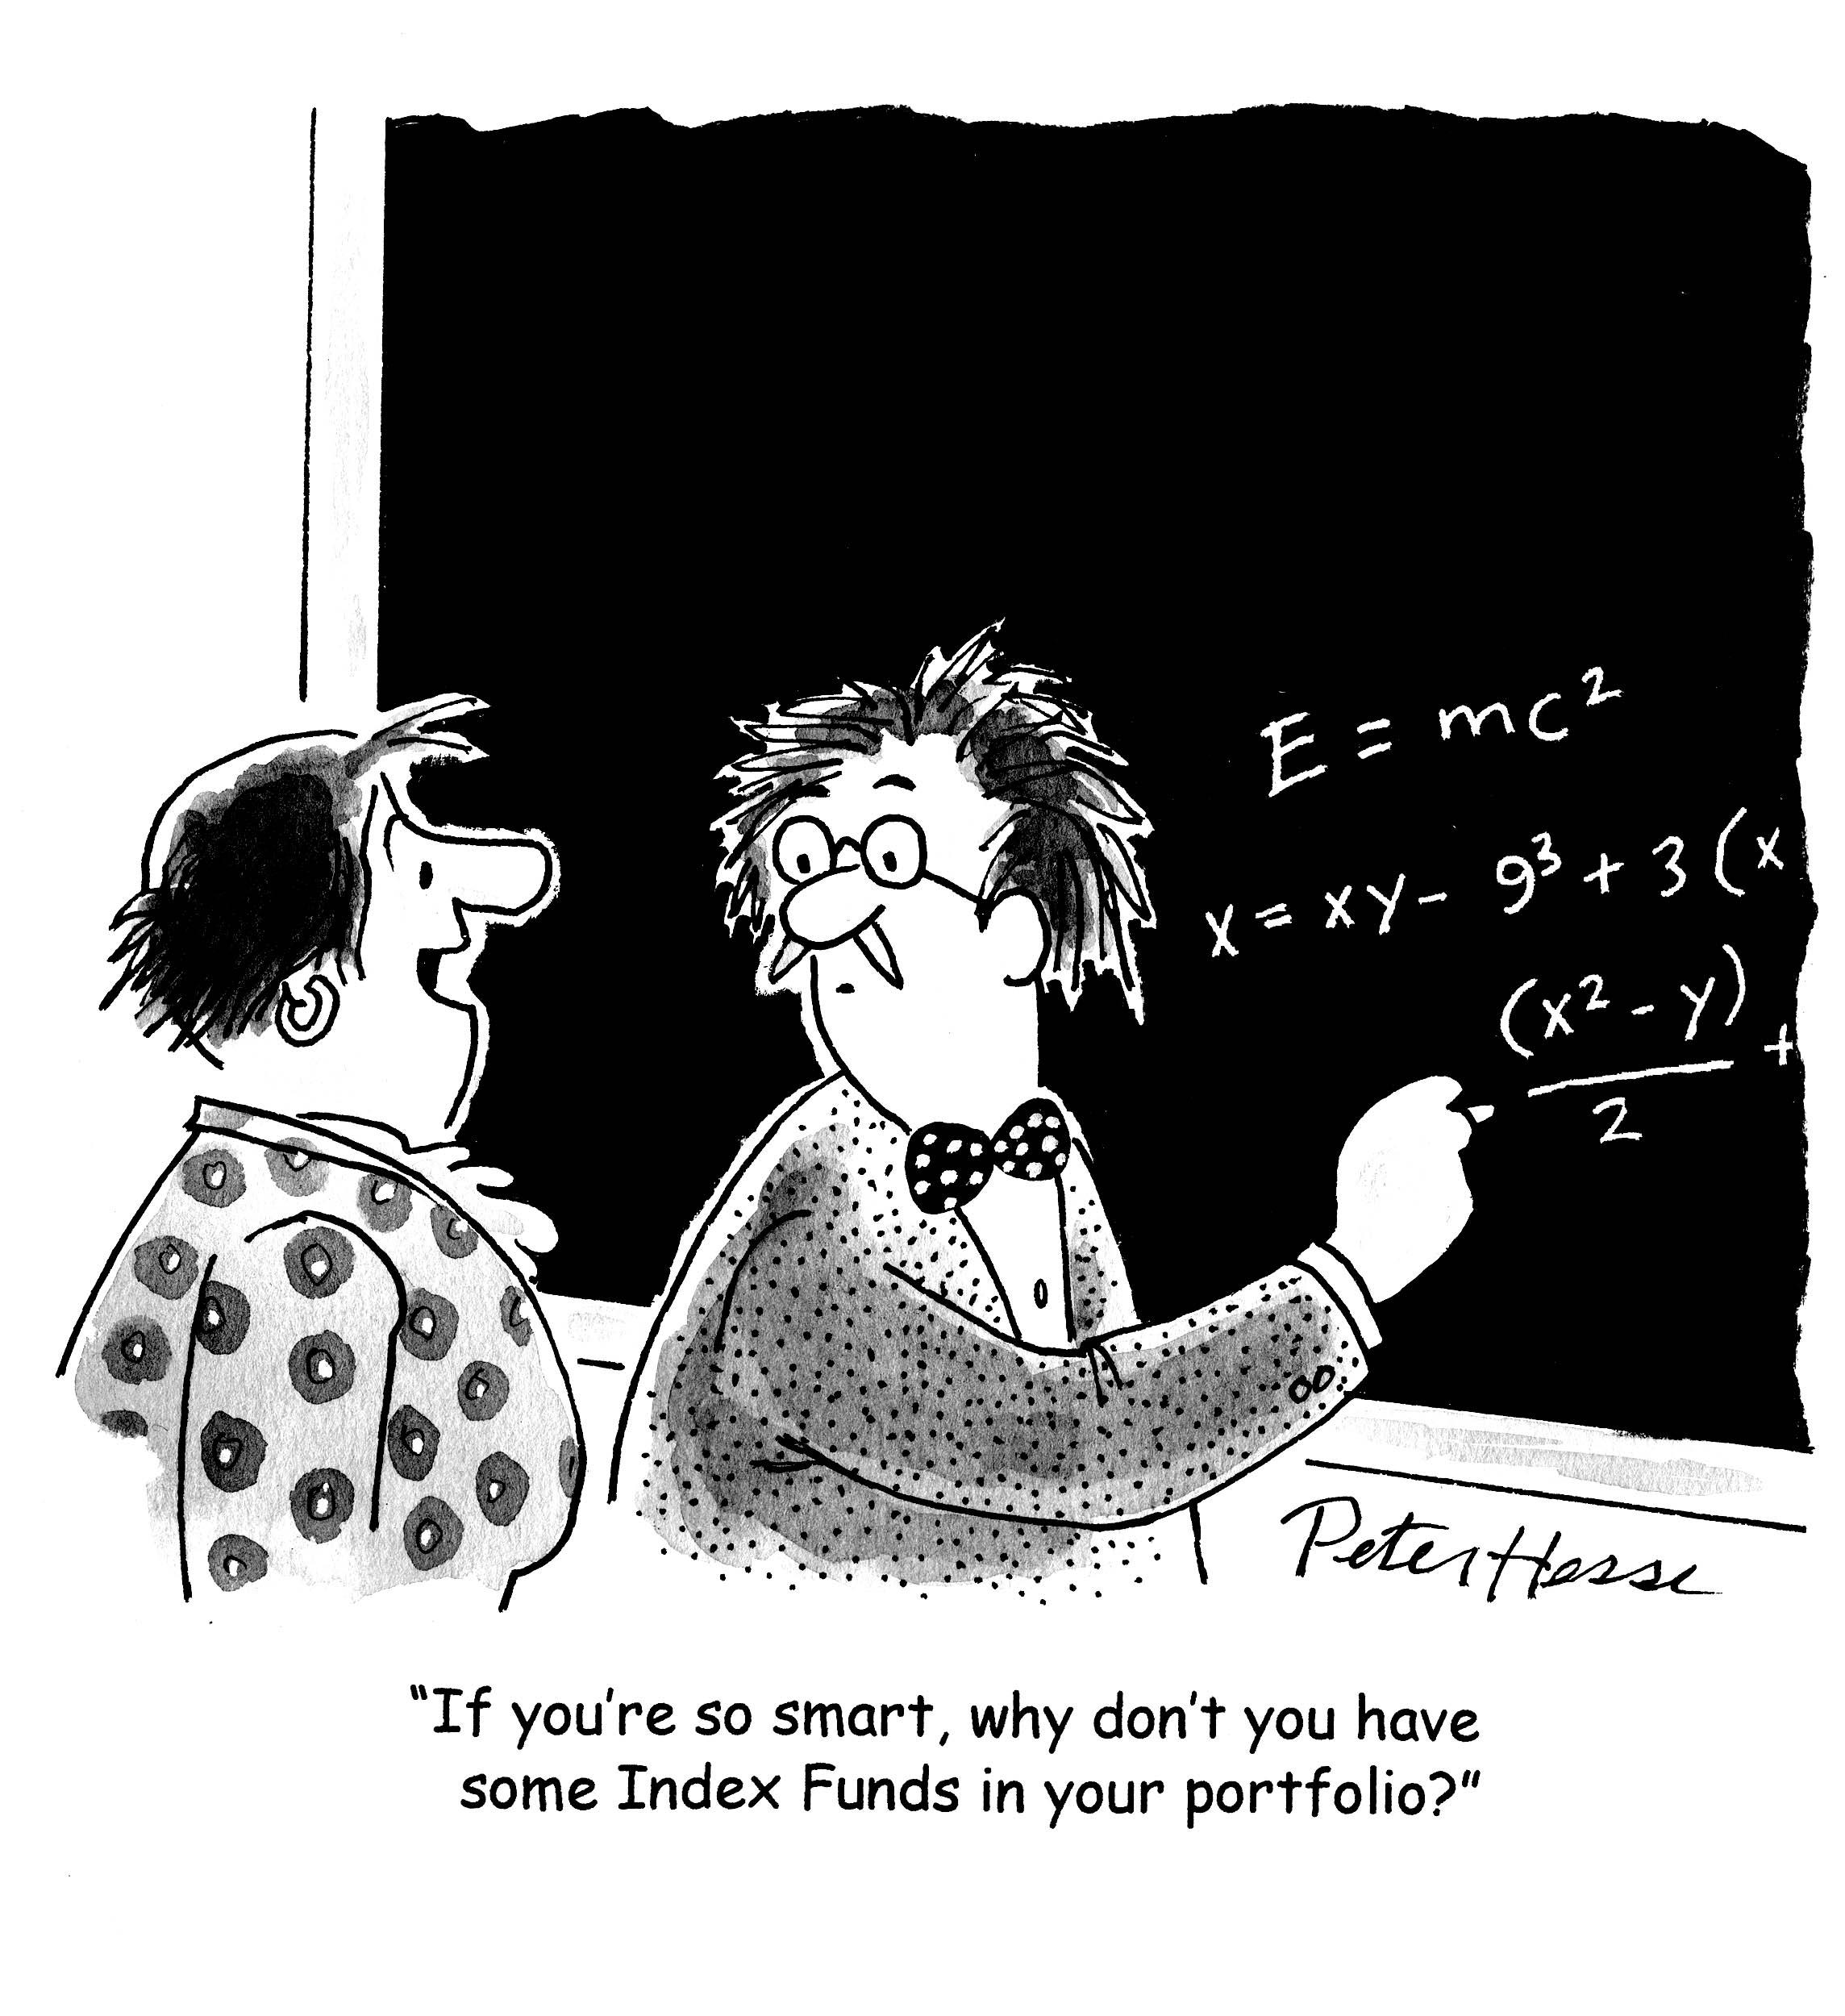 Cartoonist: Hesse, Peter; cartoonstock.com – Thursday, 1 December 2016